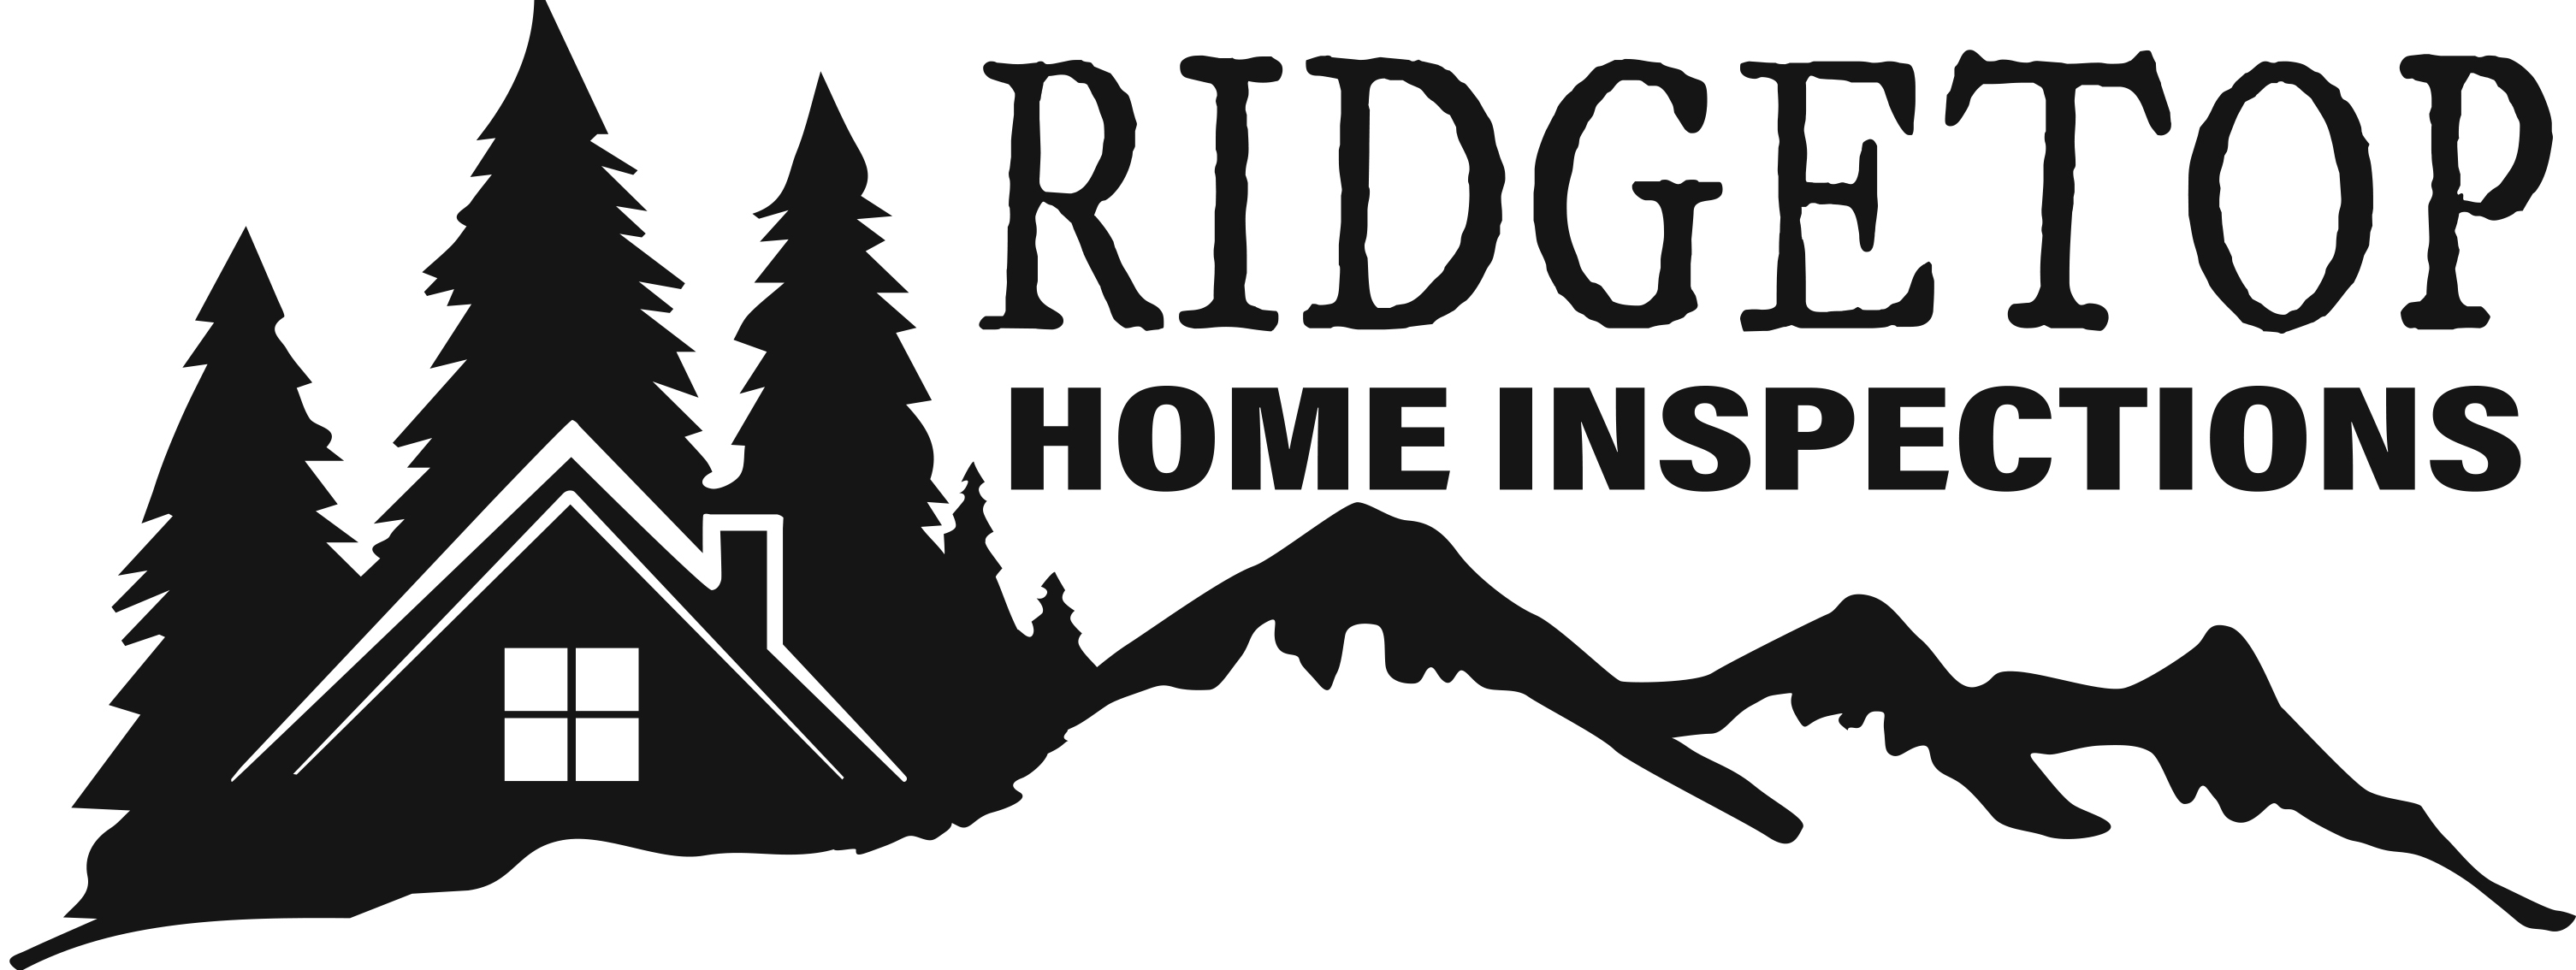 Ridgetop home inspections logo